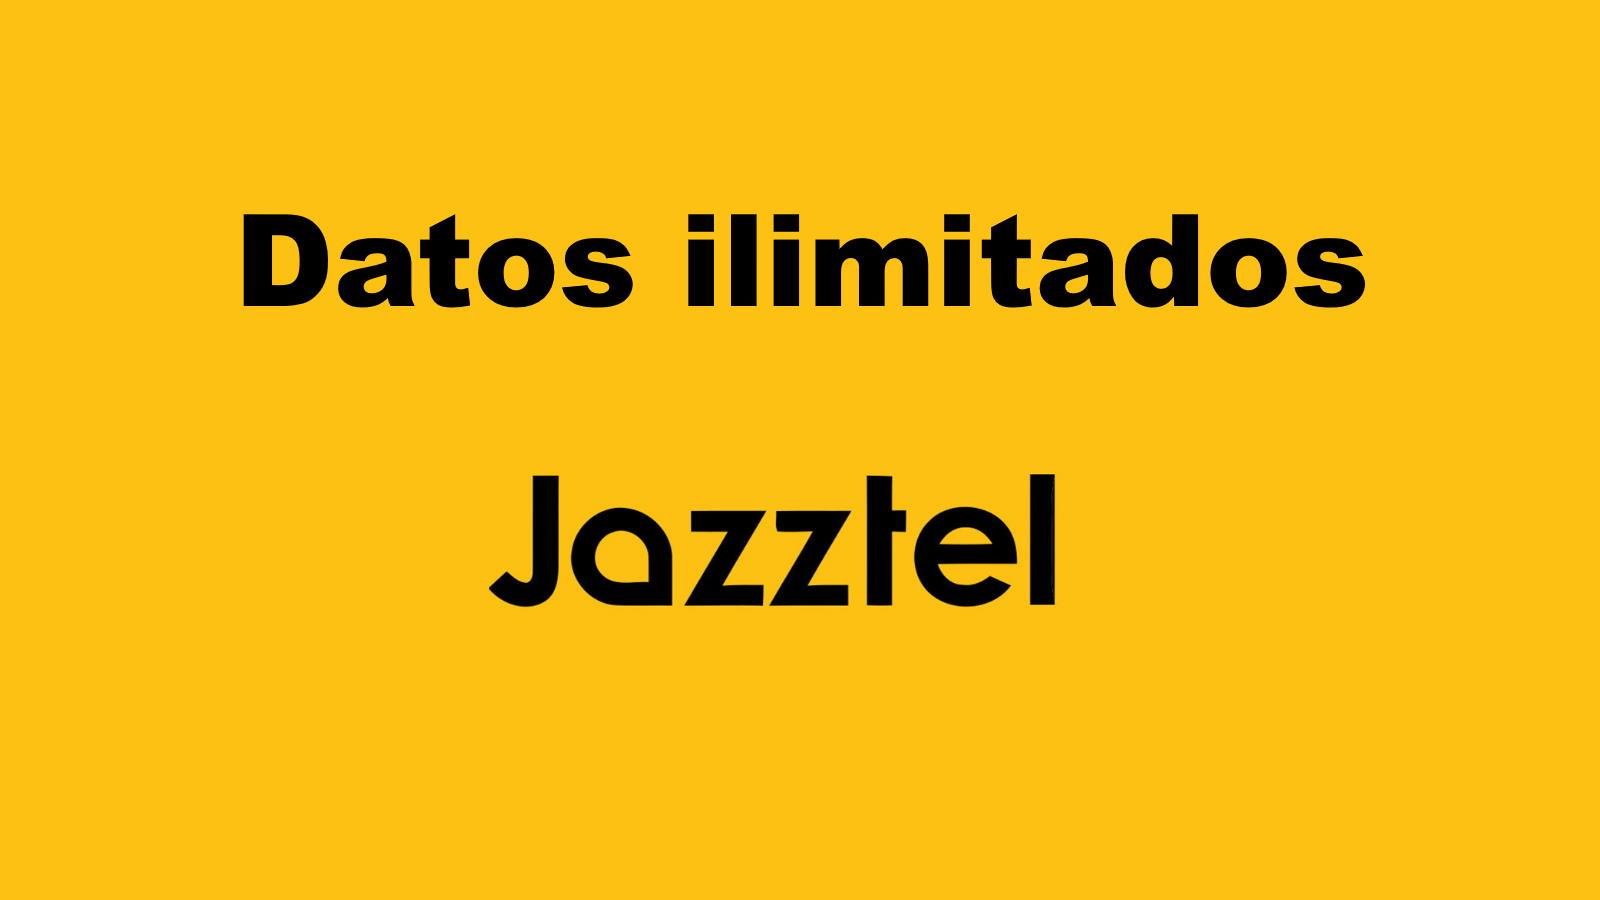 Datos ilimitados jazztel